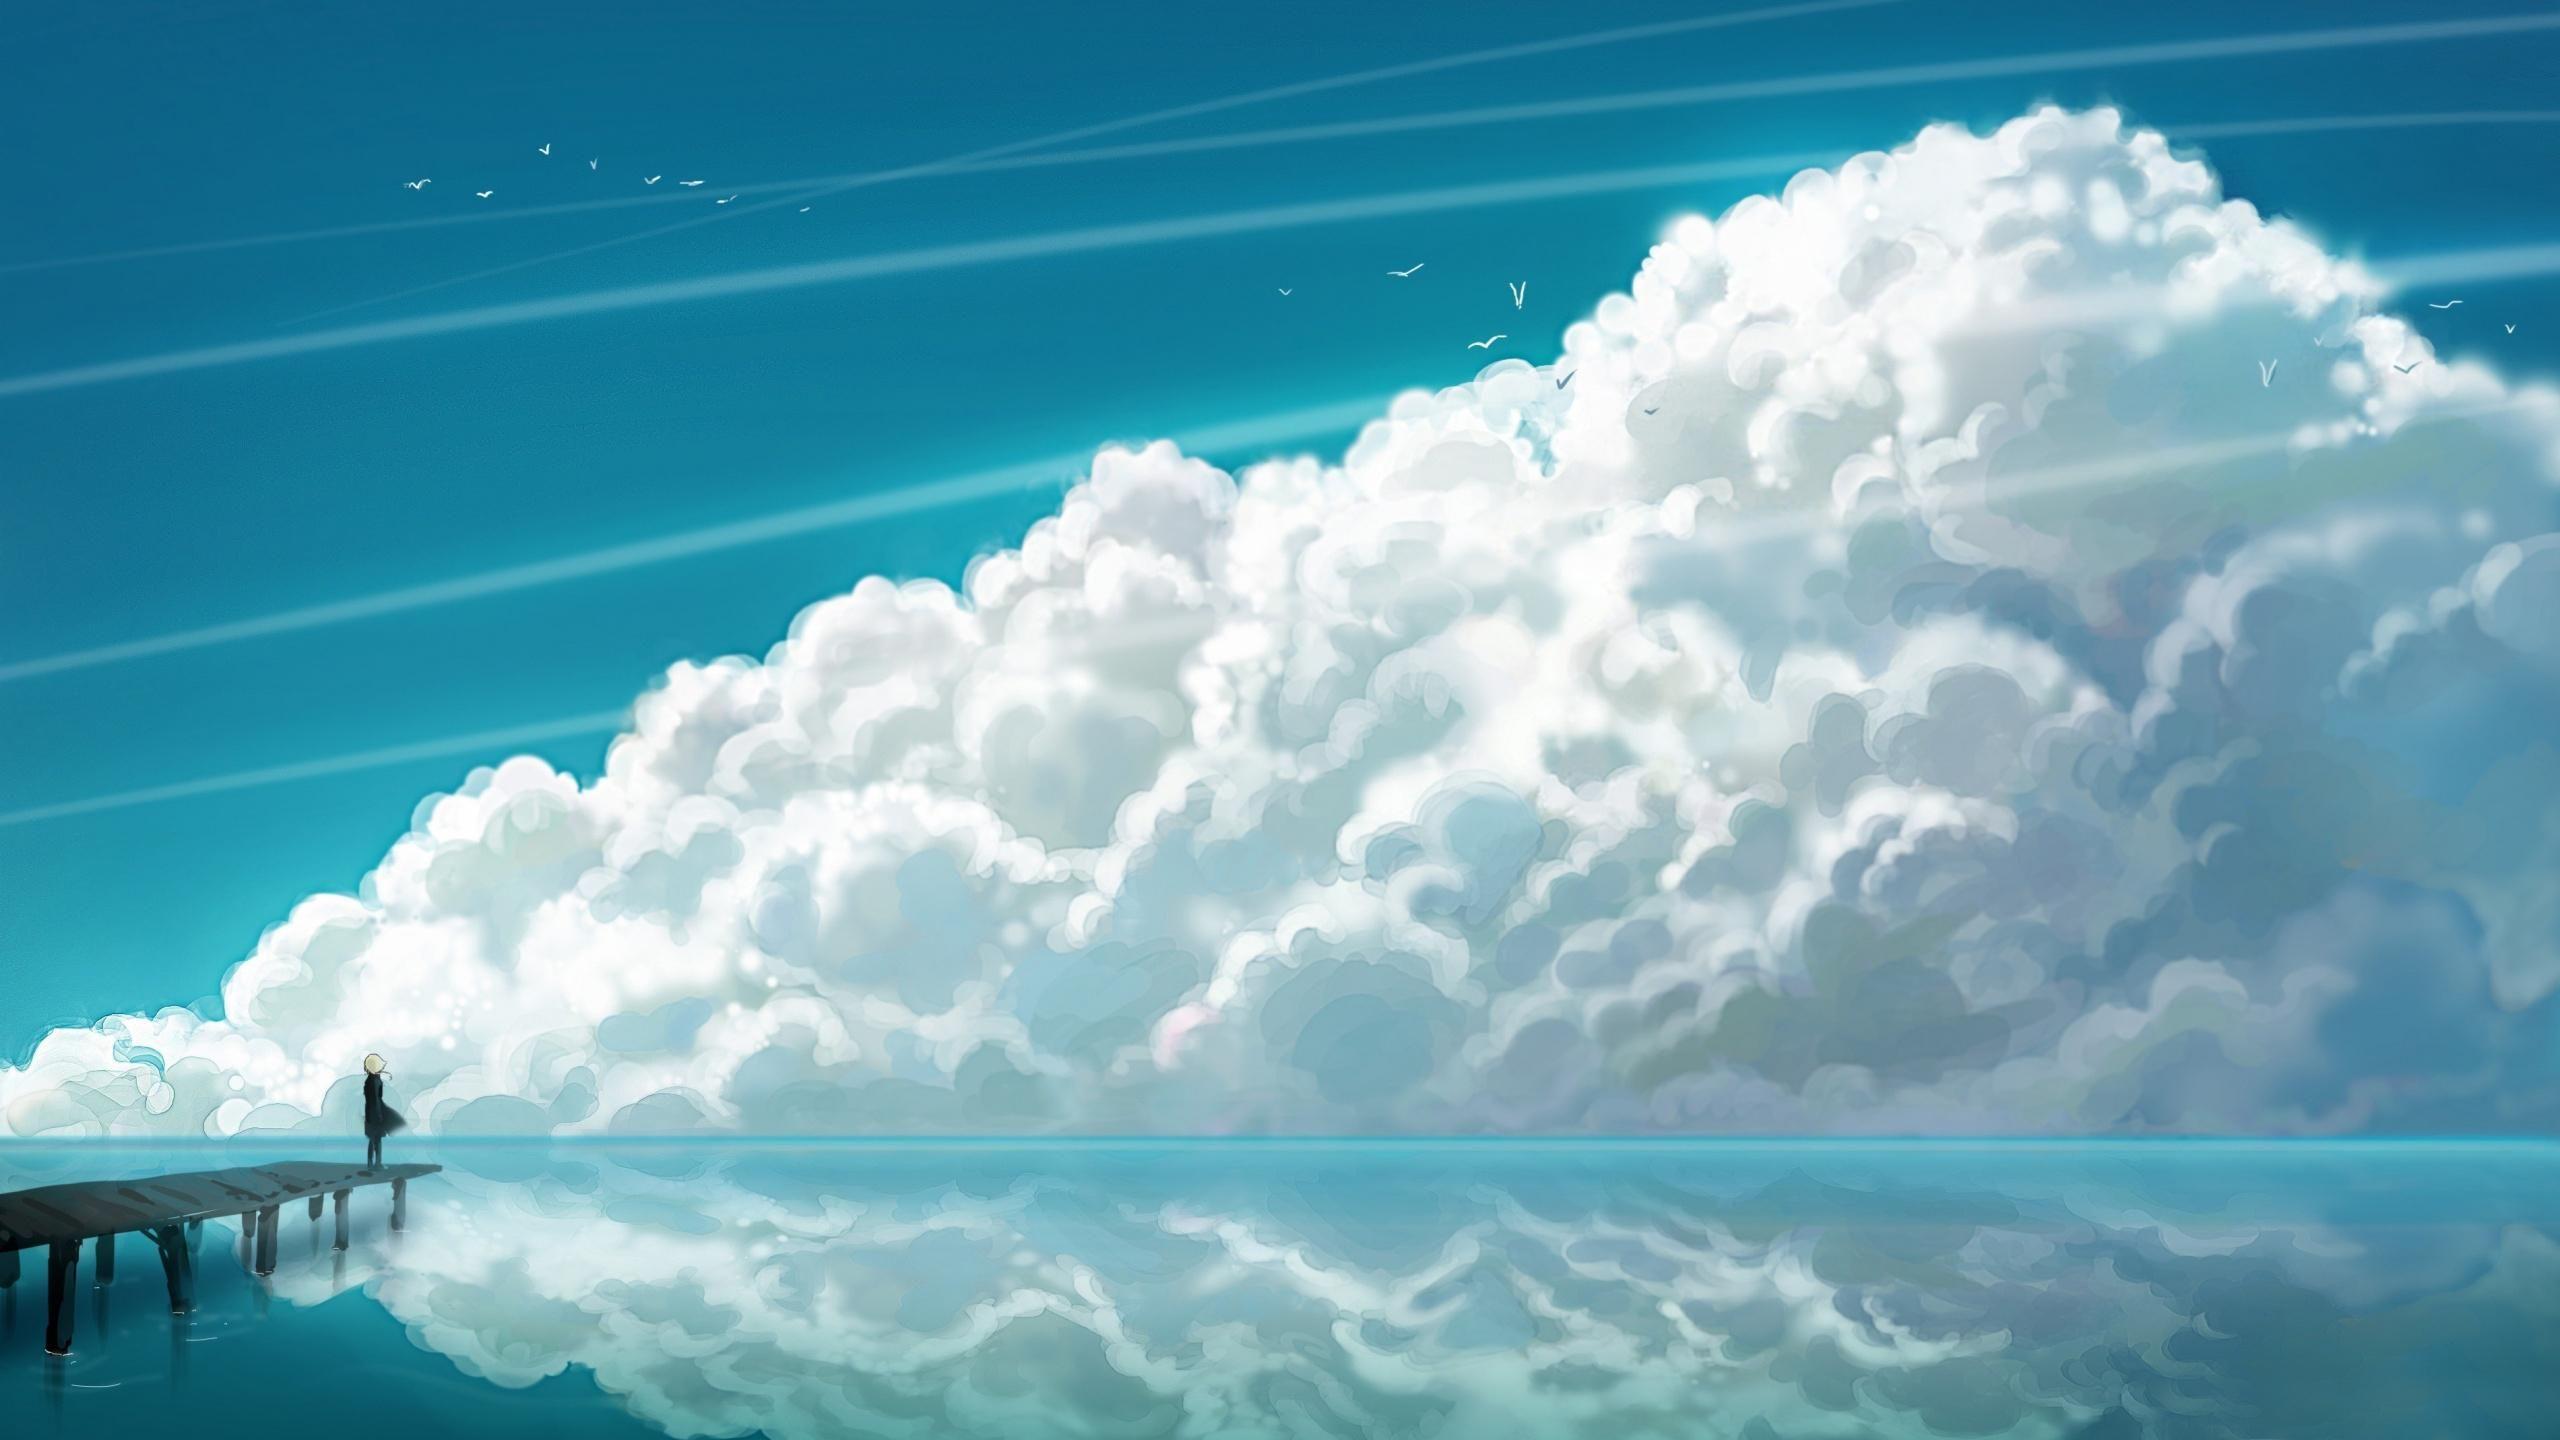 Sky Clouds. [2560x1440] Anime scenery wallpaper, Scenery